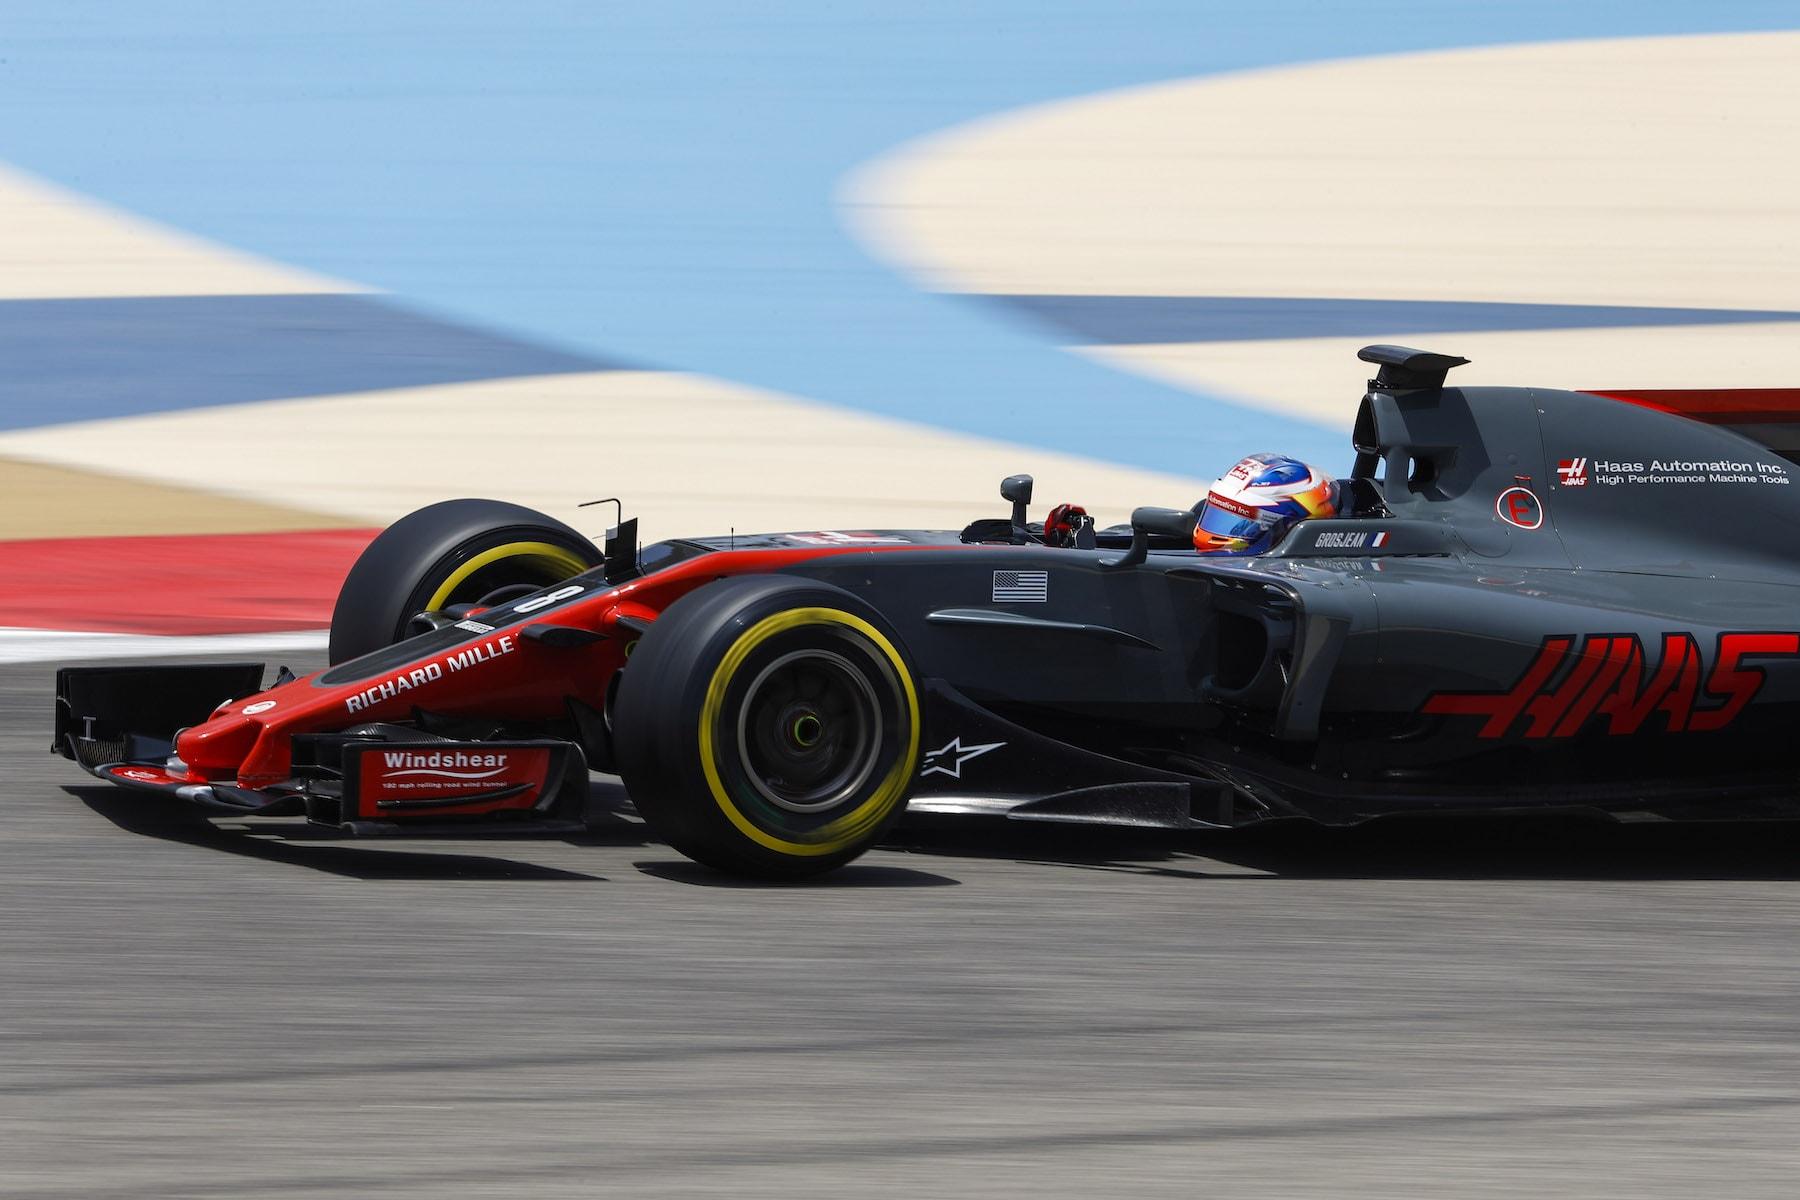 2017 Romain Grosjean | Haas VF17 | 2017 bahrain Test 1 copy.jpg